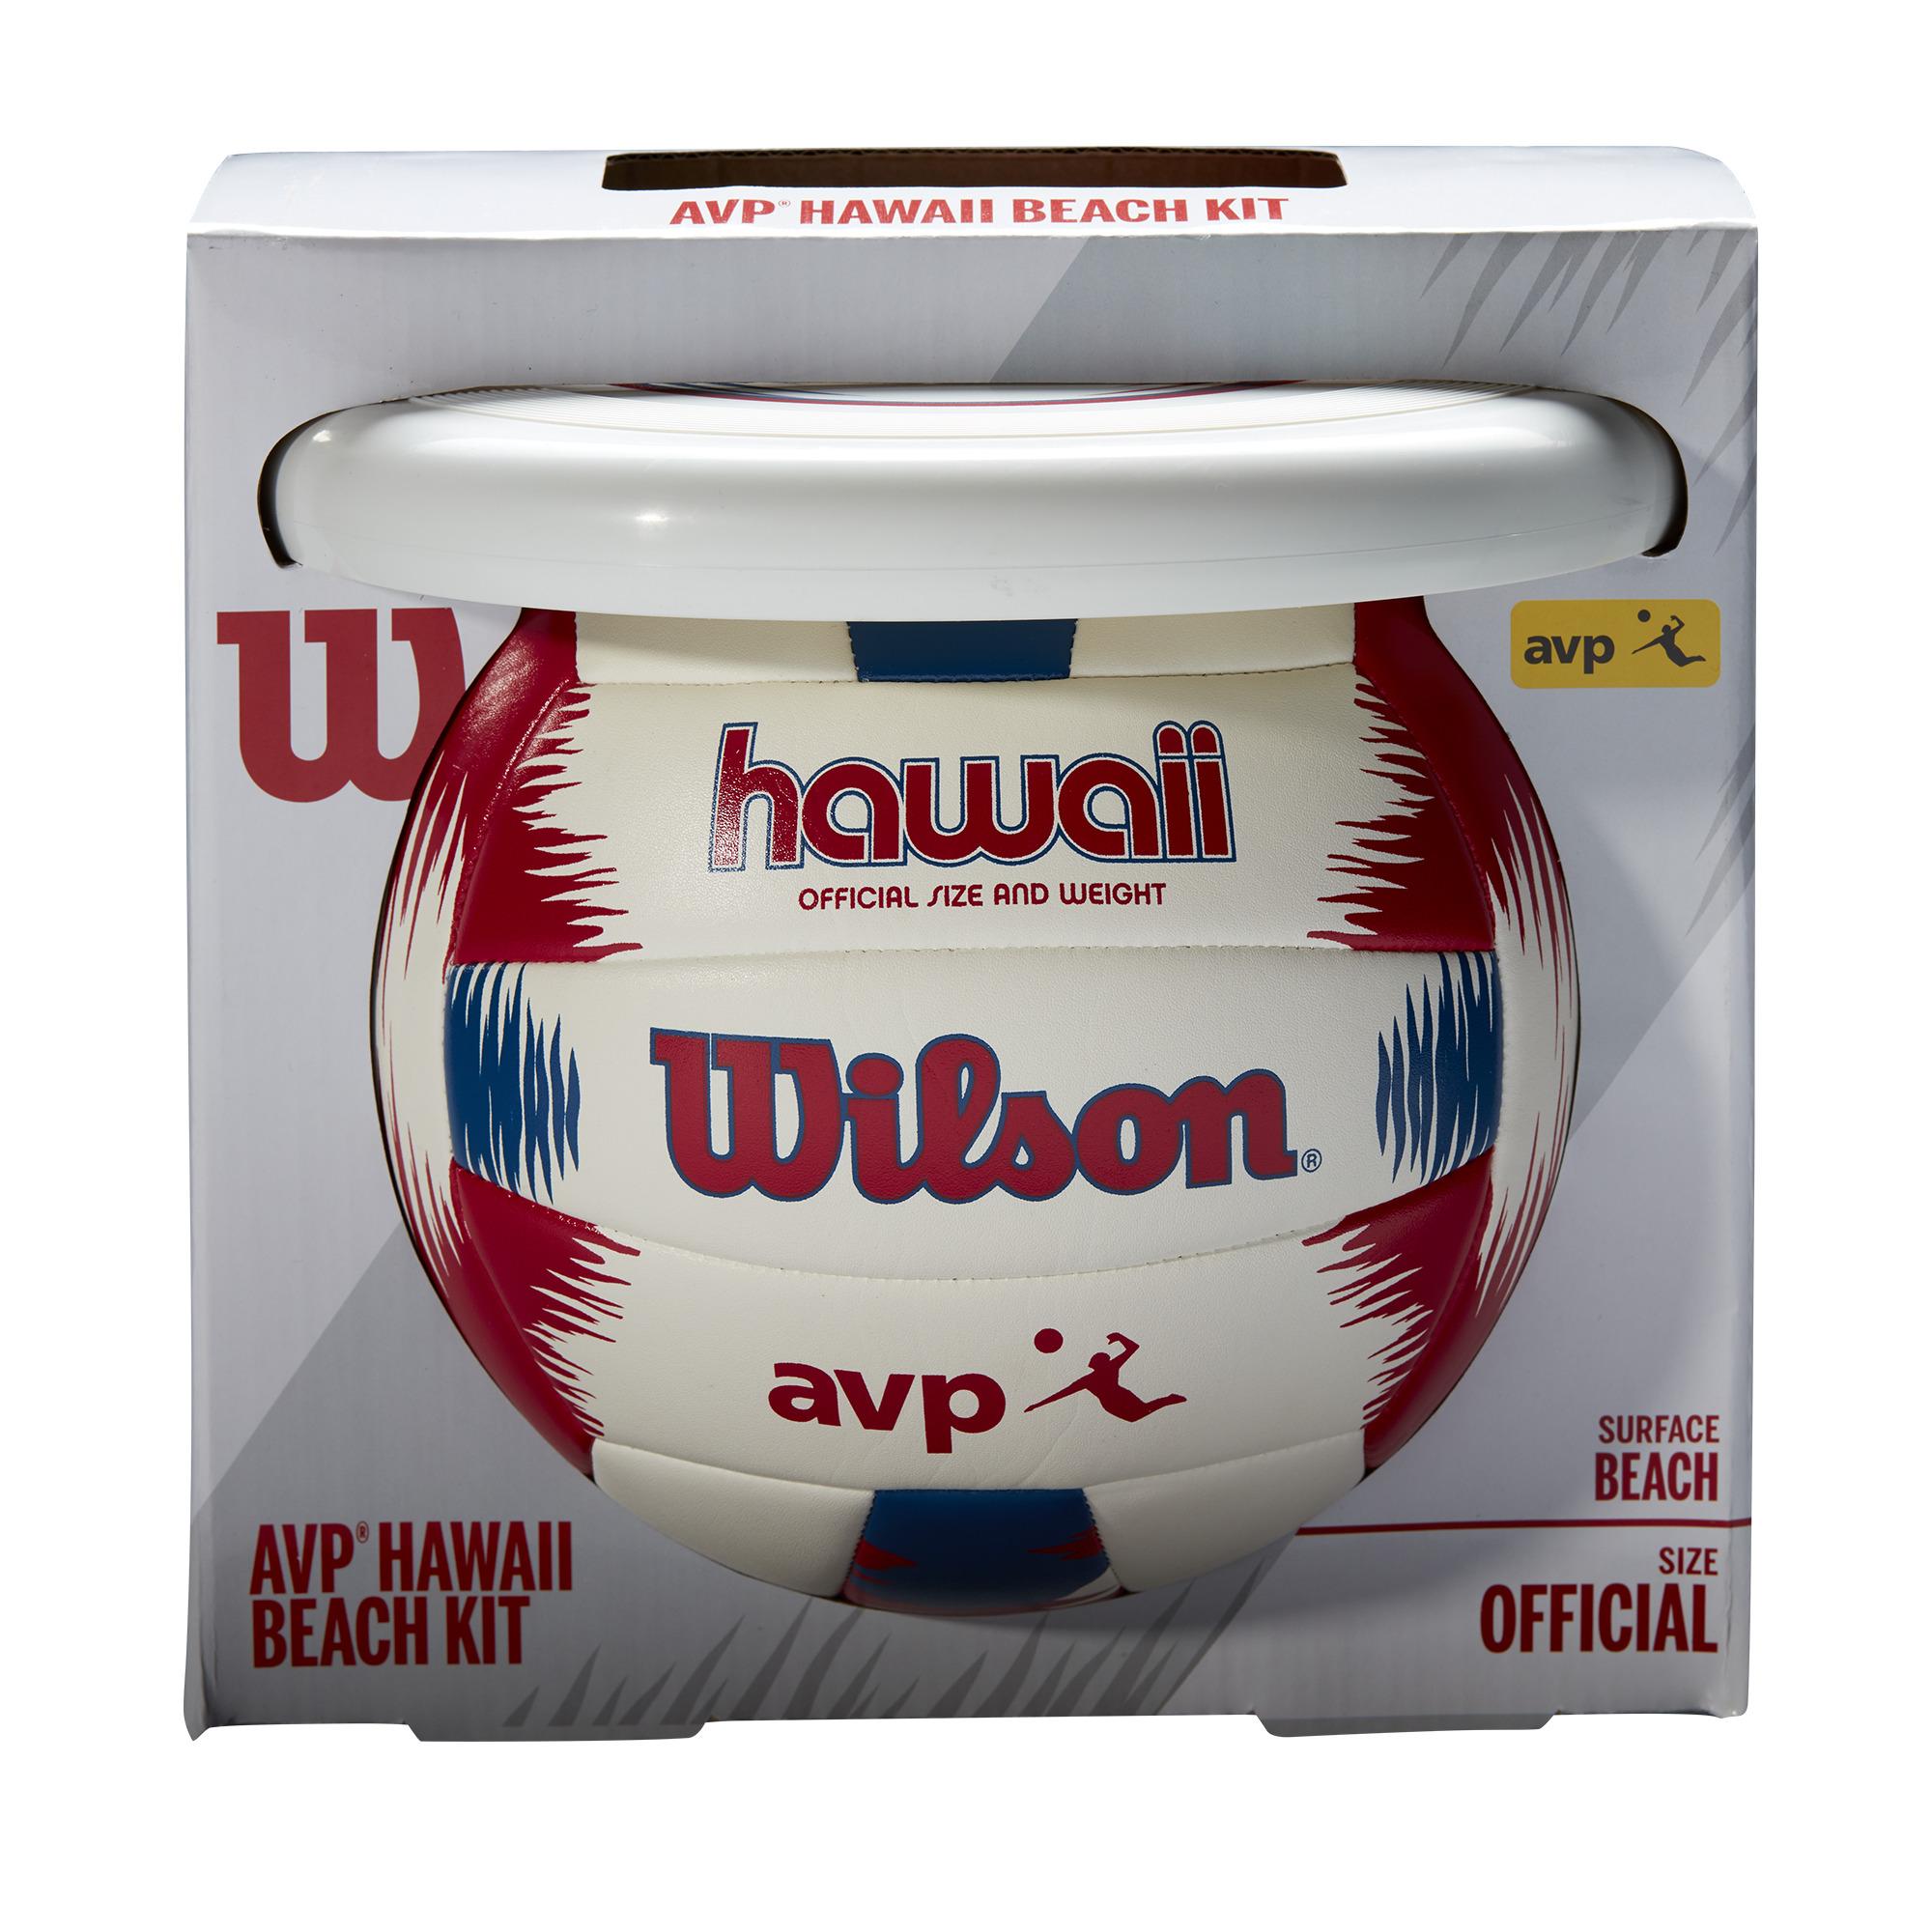 WILSON HAWAII AVP Summer Kit bumba